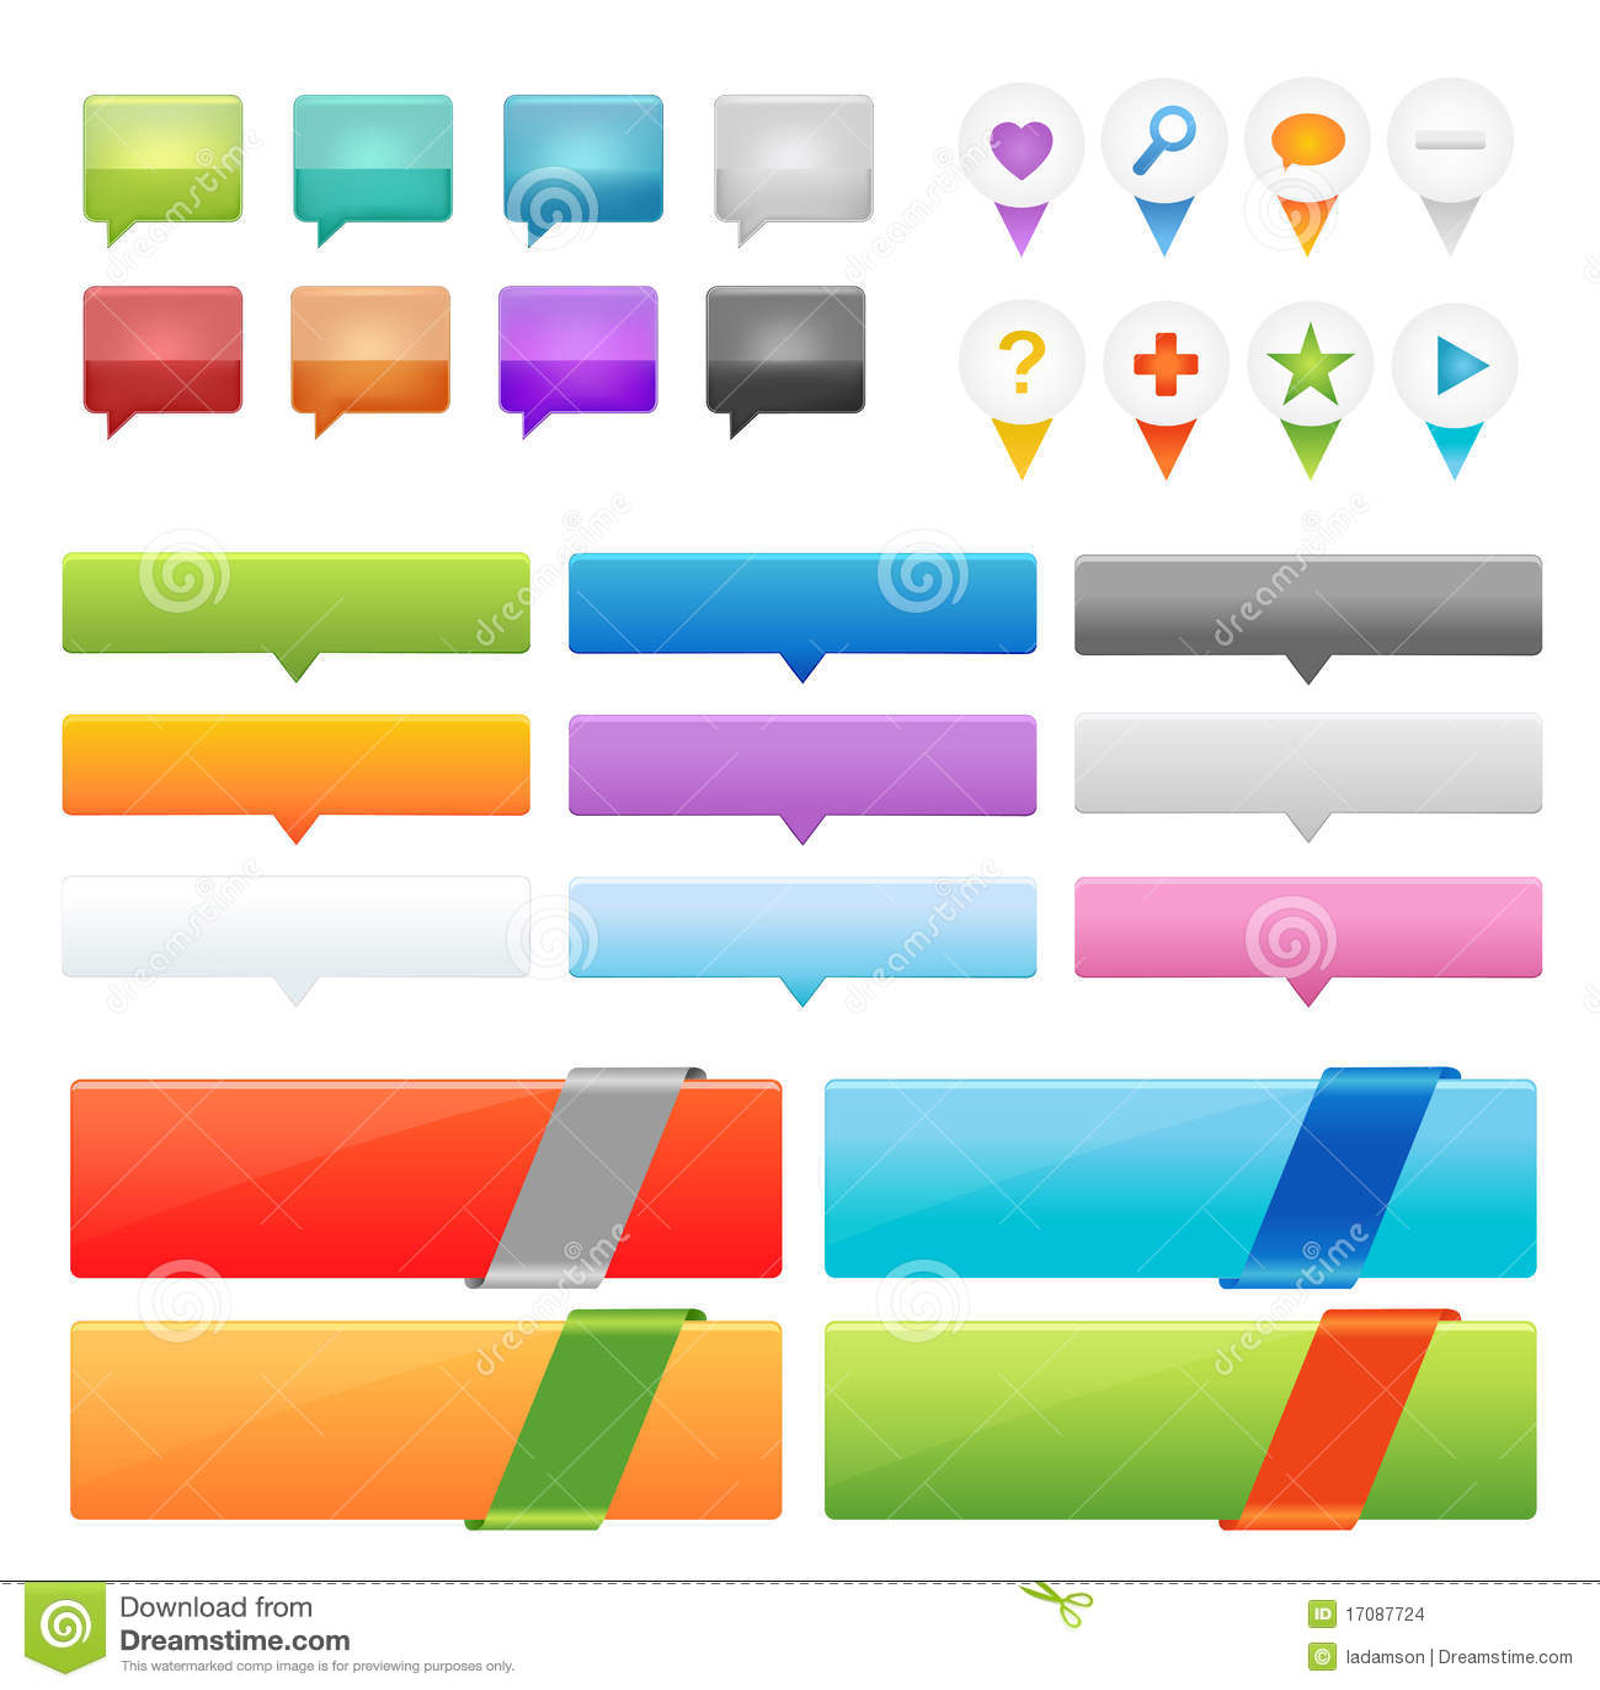 Web Design Frame. Vector Stock Images - Image: 17087724: www.dreamstime.com/stock-images-web-design-frame-vector-image17087724